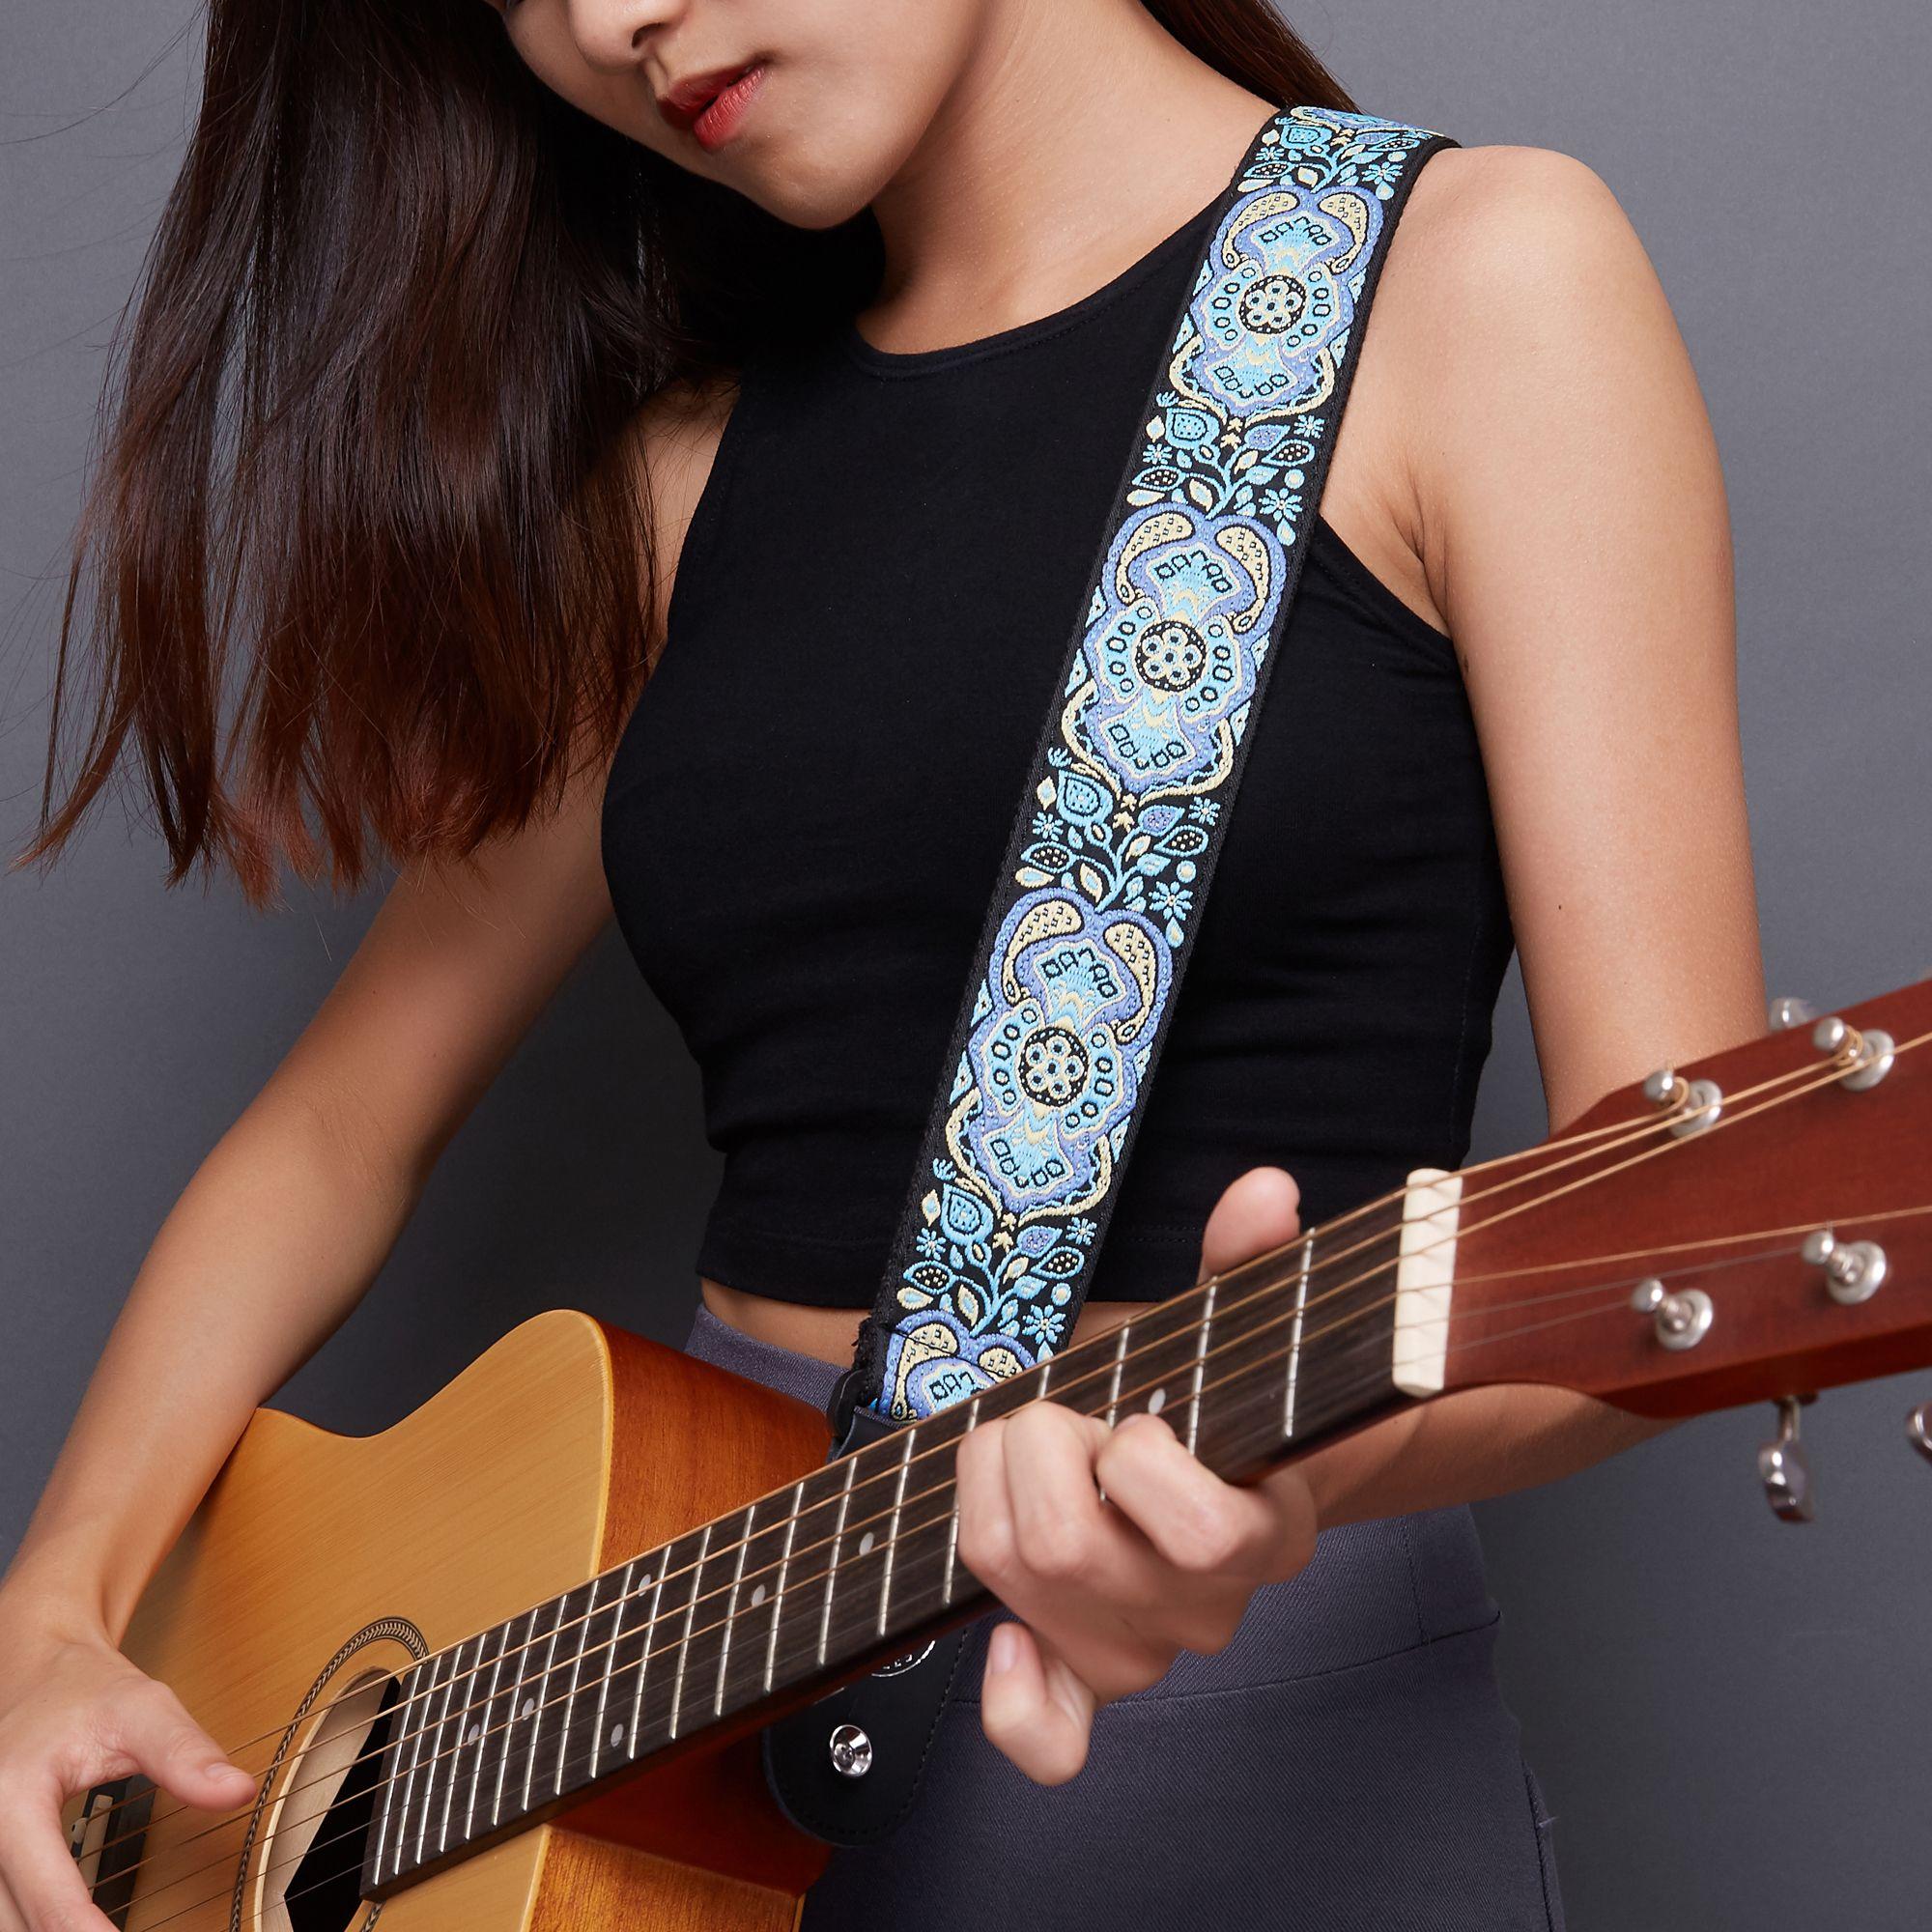 Amumu Adjustable Jacquard Retro Style Polyester Guitar Strap Blue High Quality Material Woven Cotton Top Polyester W Guitar Strap Guitar Guitar Strap Vintage